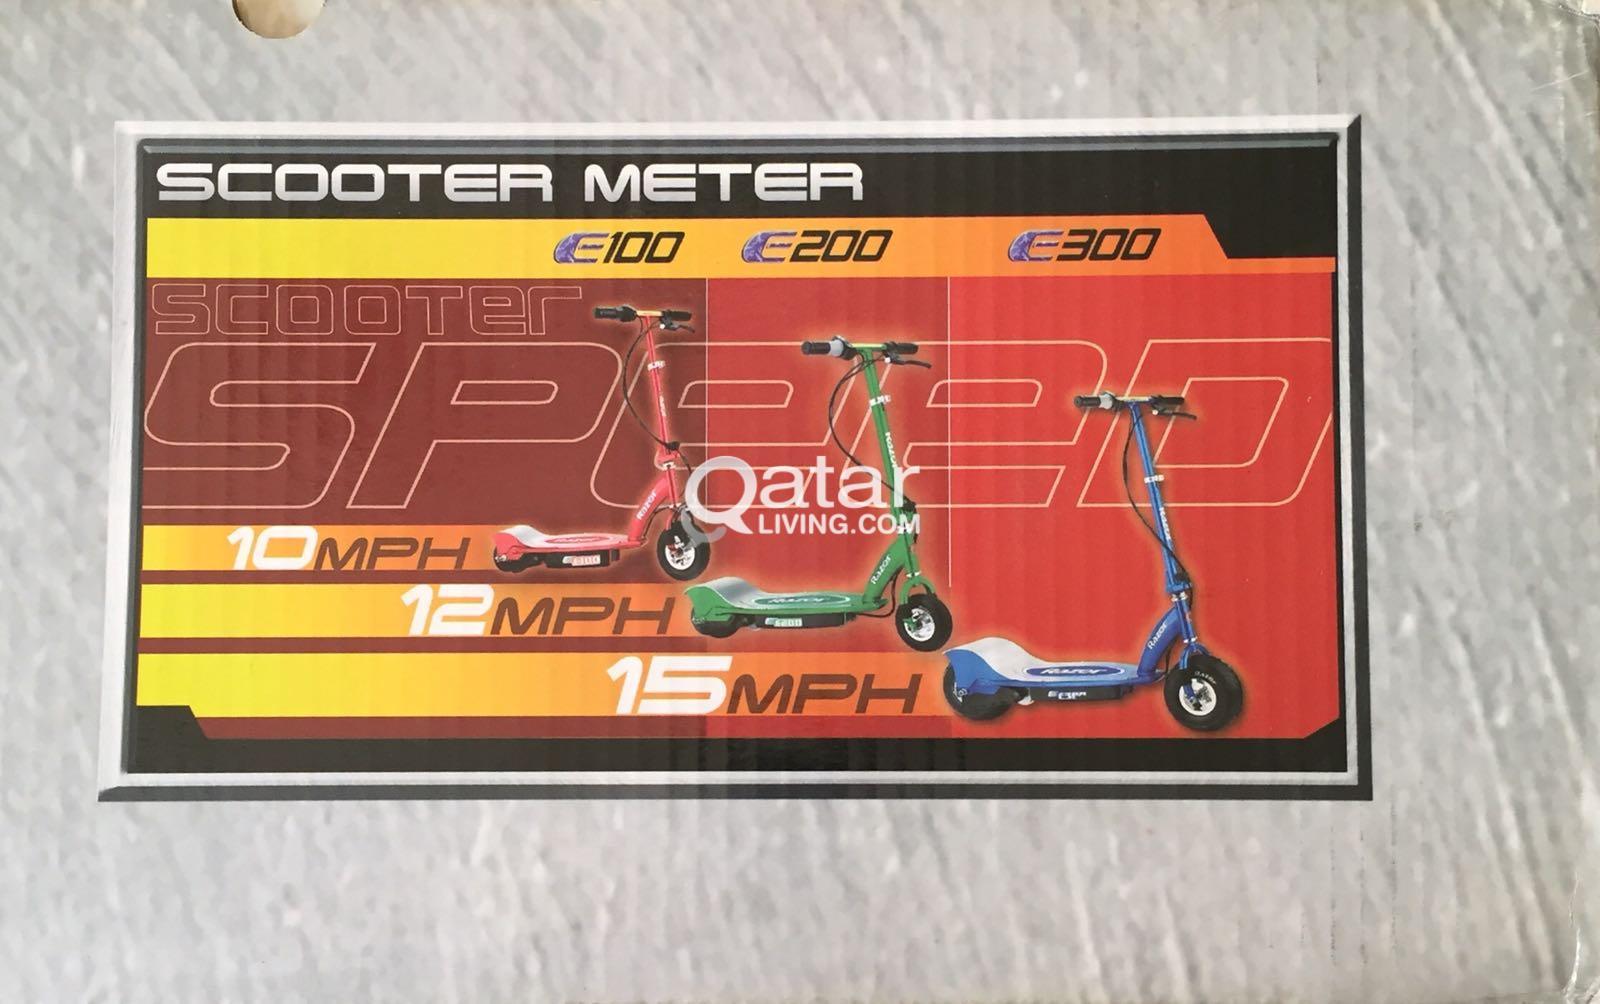 Razor E300s Electric Scooter For Sale | Qatar Living